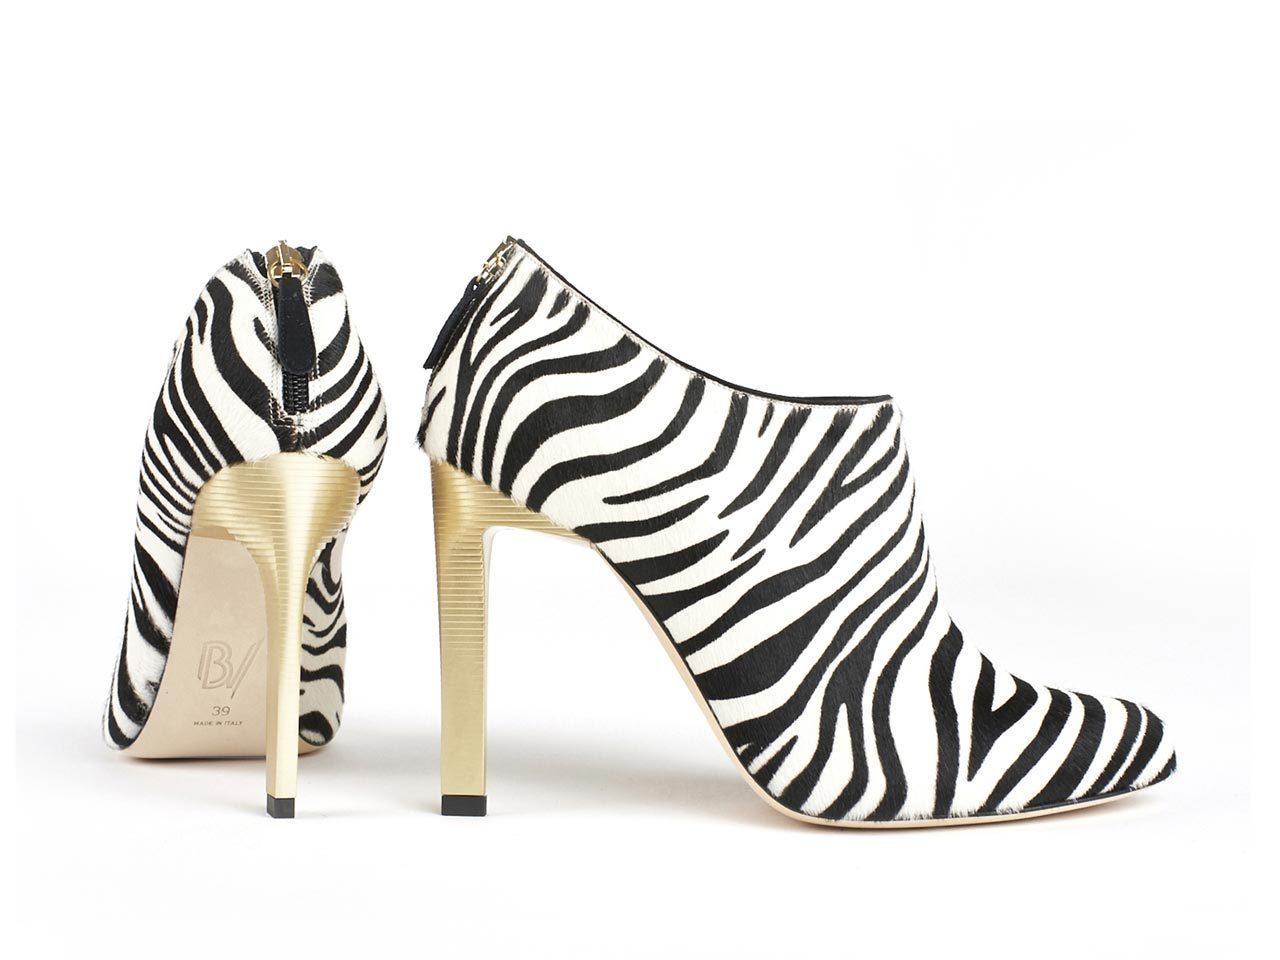 Escarpins Zebra Bettina Vermillon